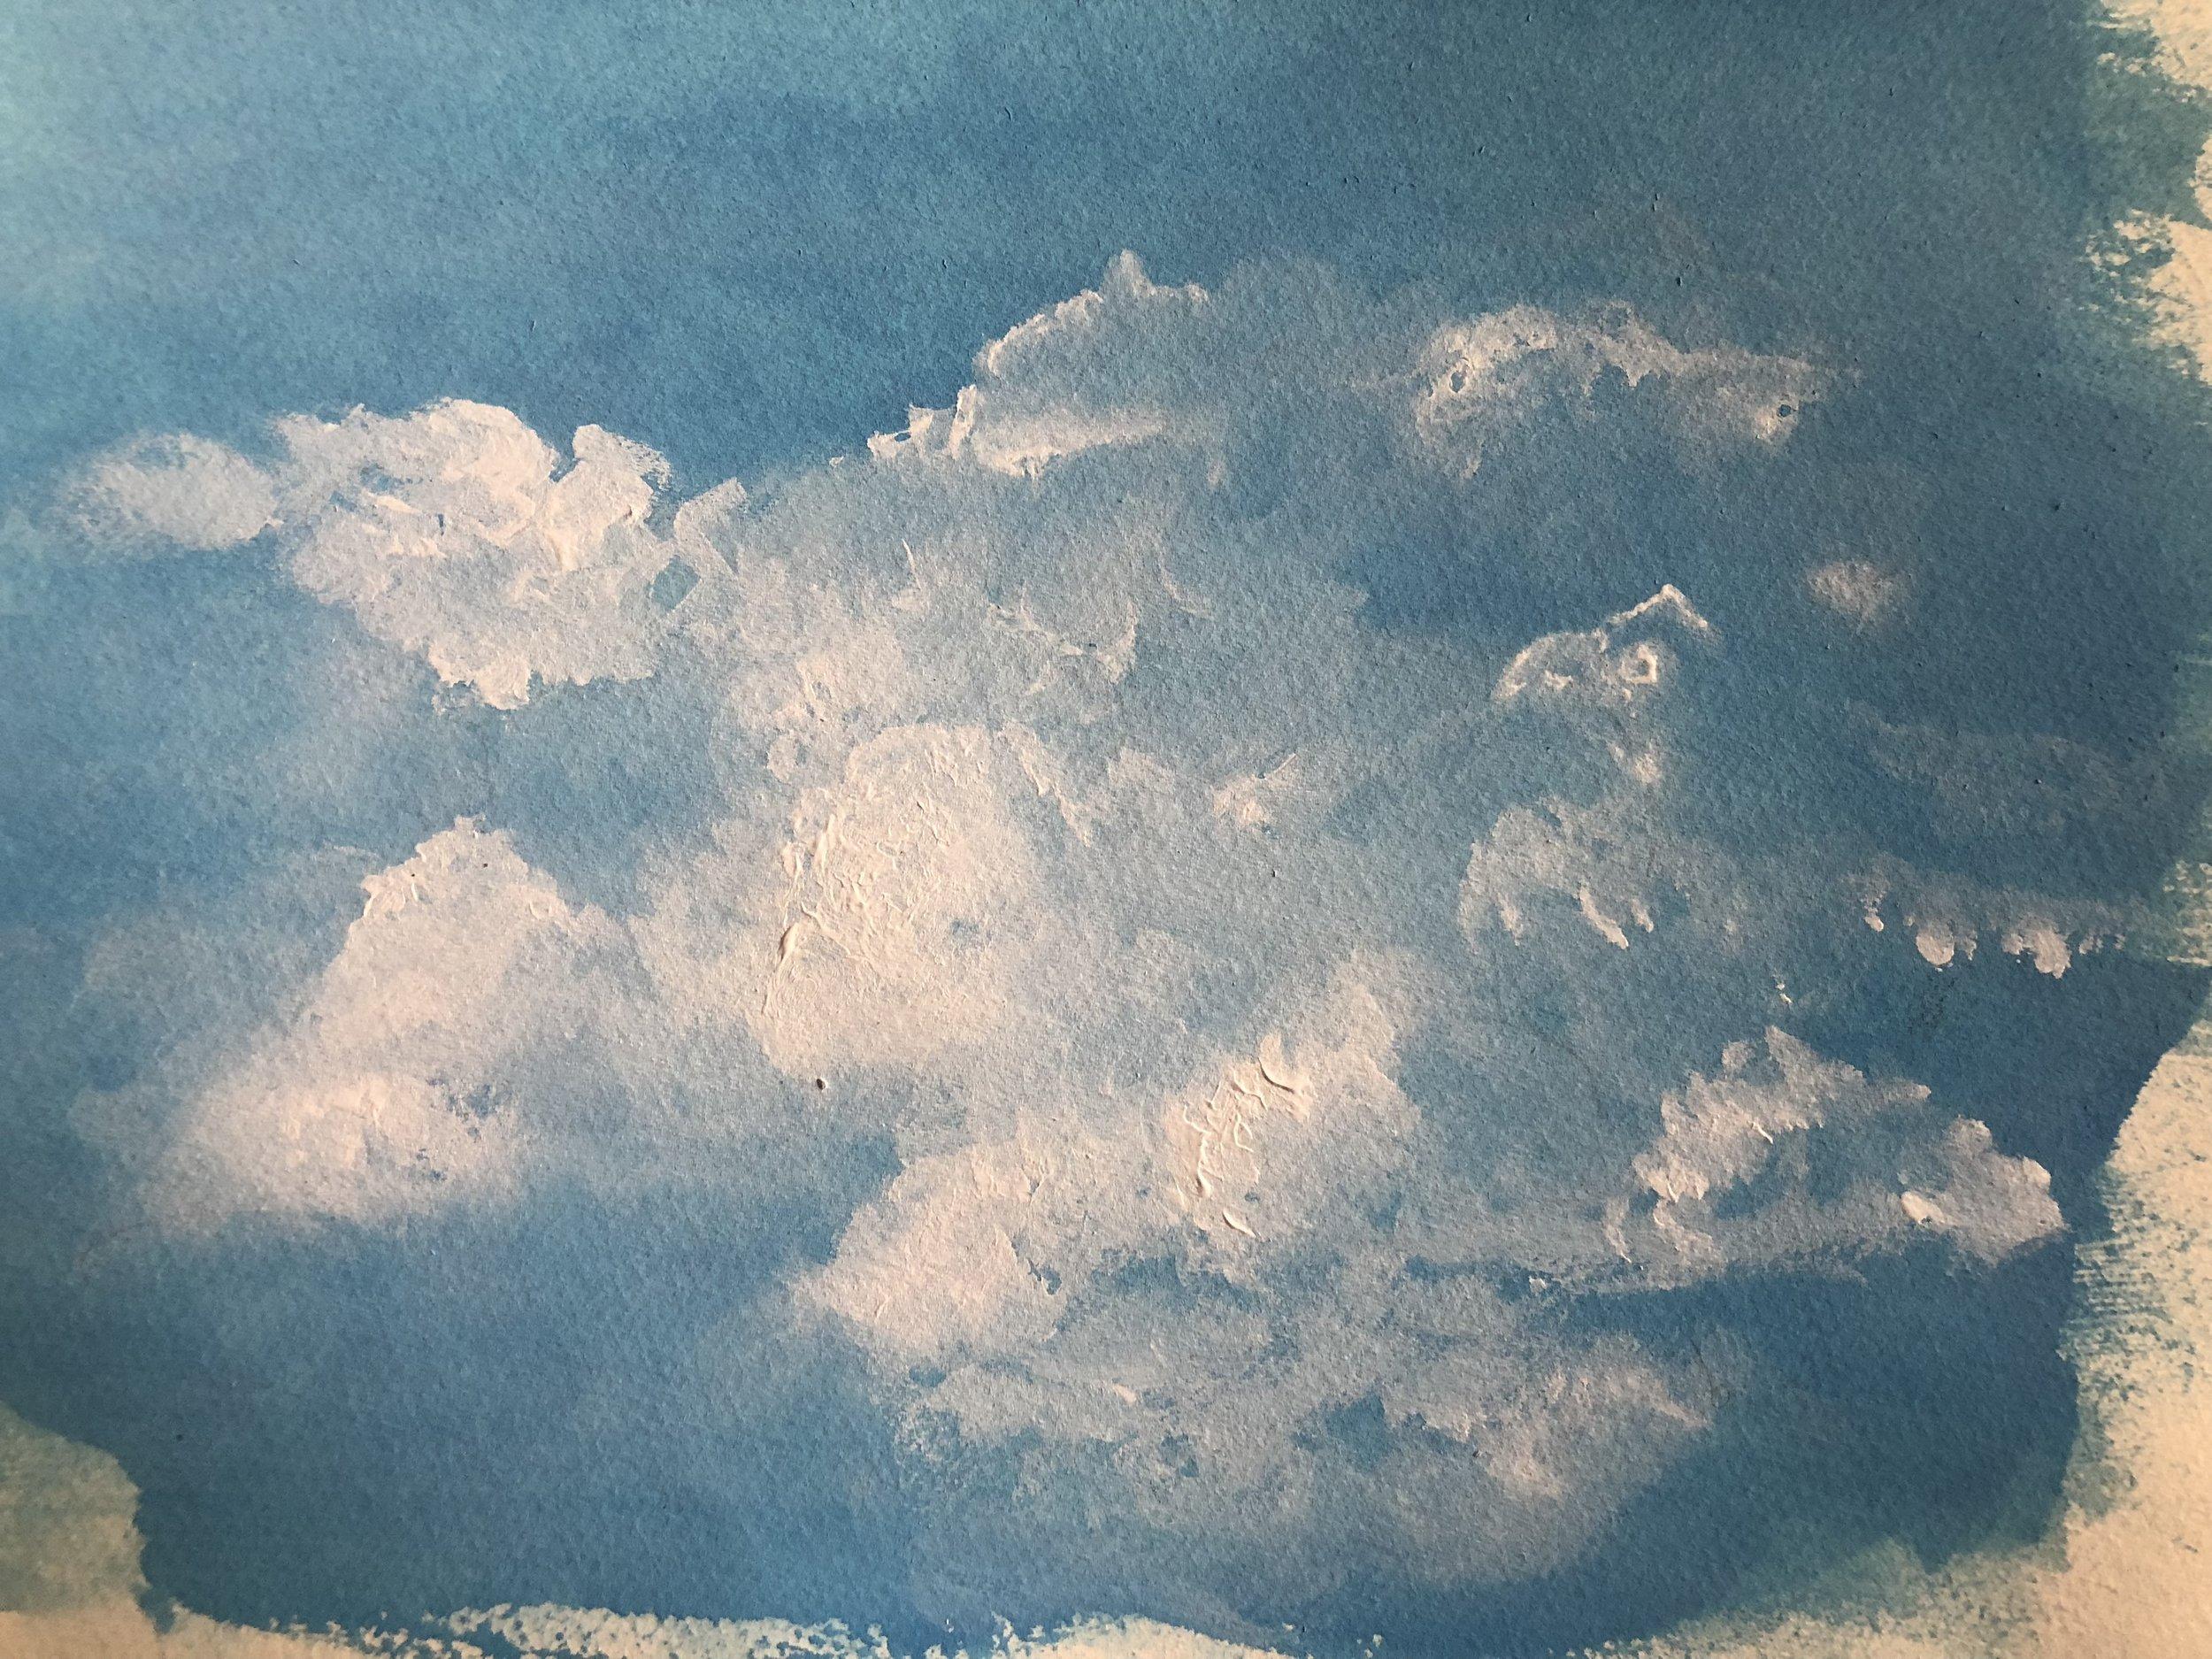 Sky_Clouds_CandiceKayeDesign.jpg